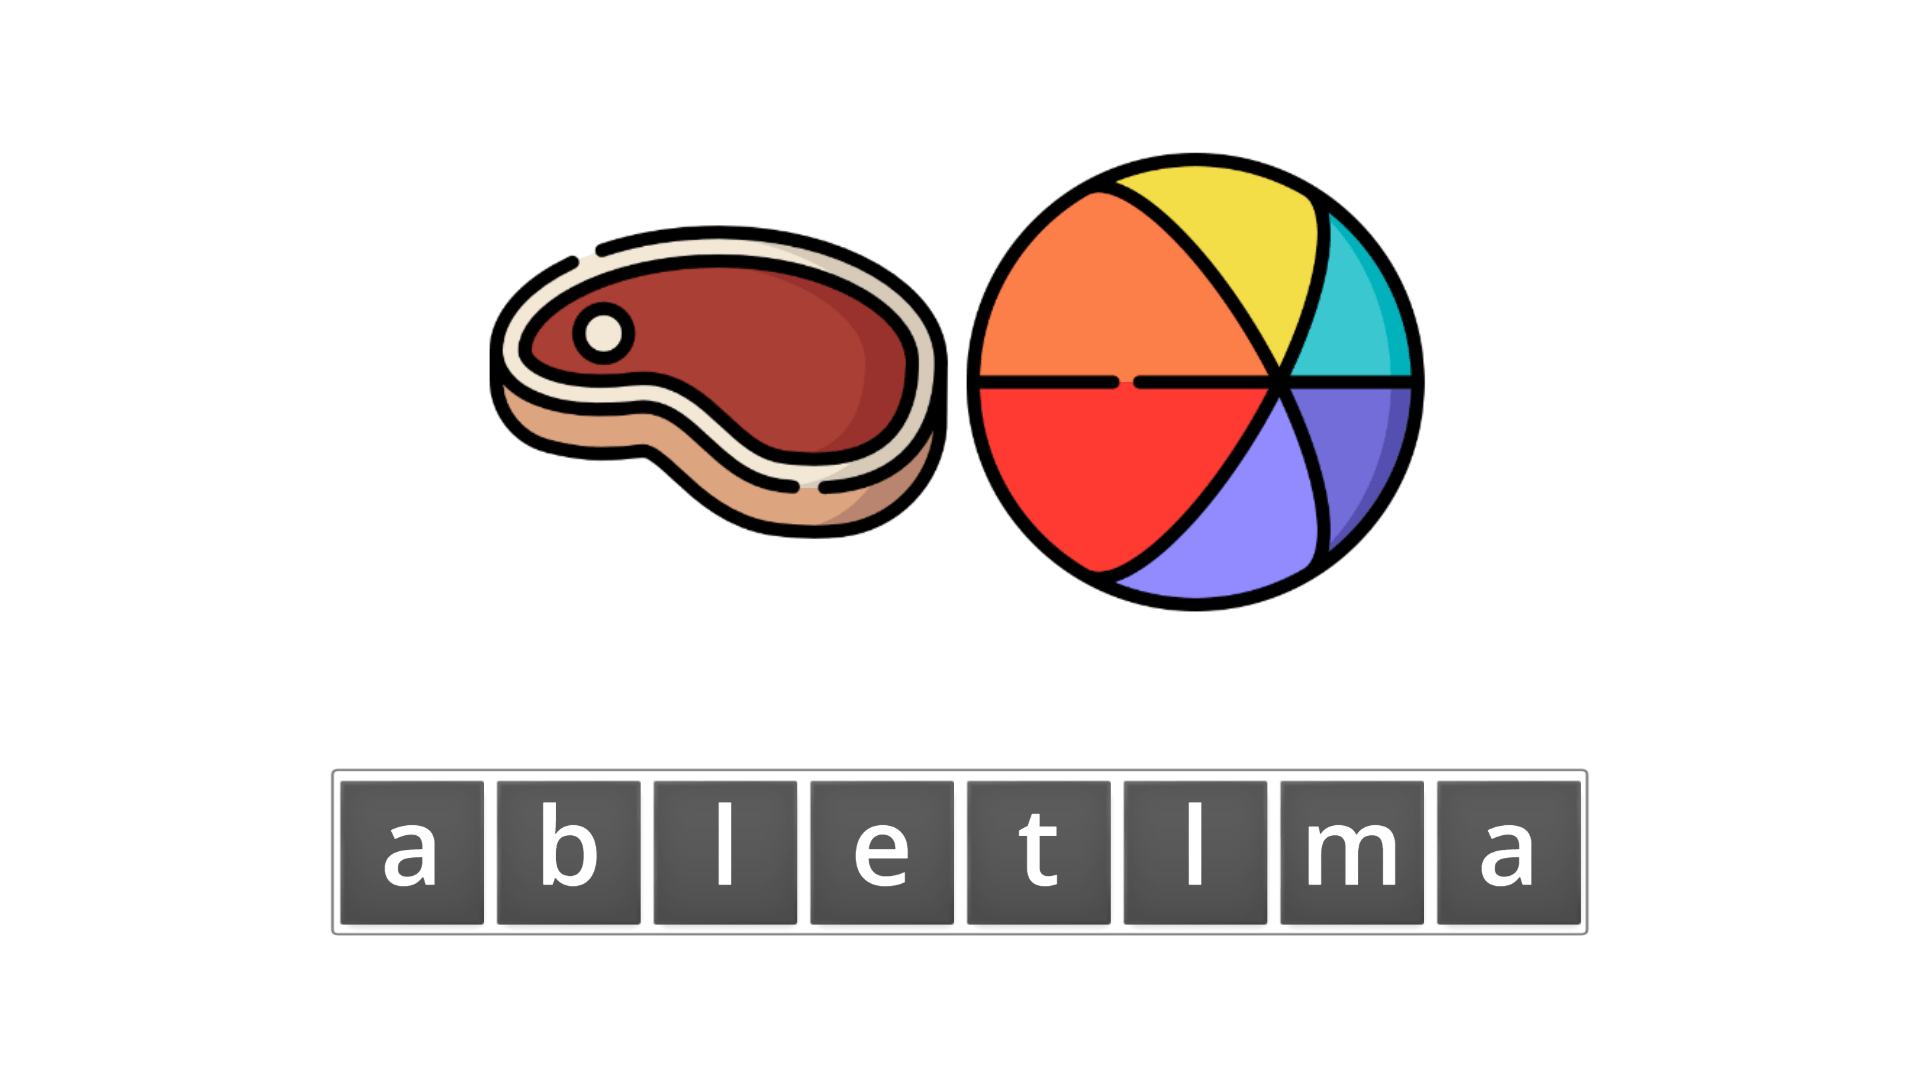 esl resources - flashcards - compound nouns  - unscramble - meatball